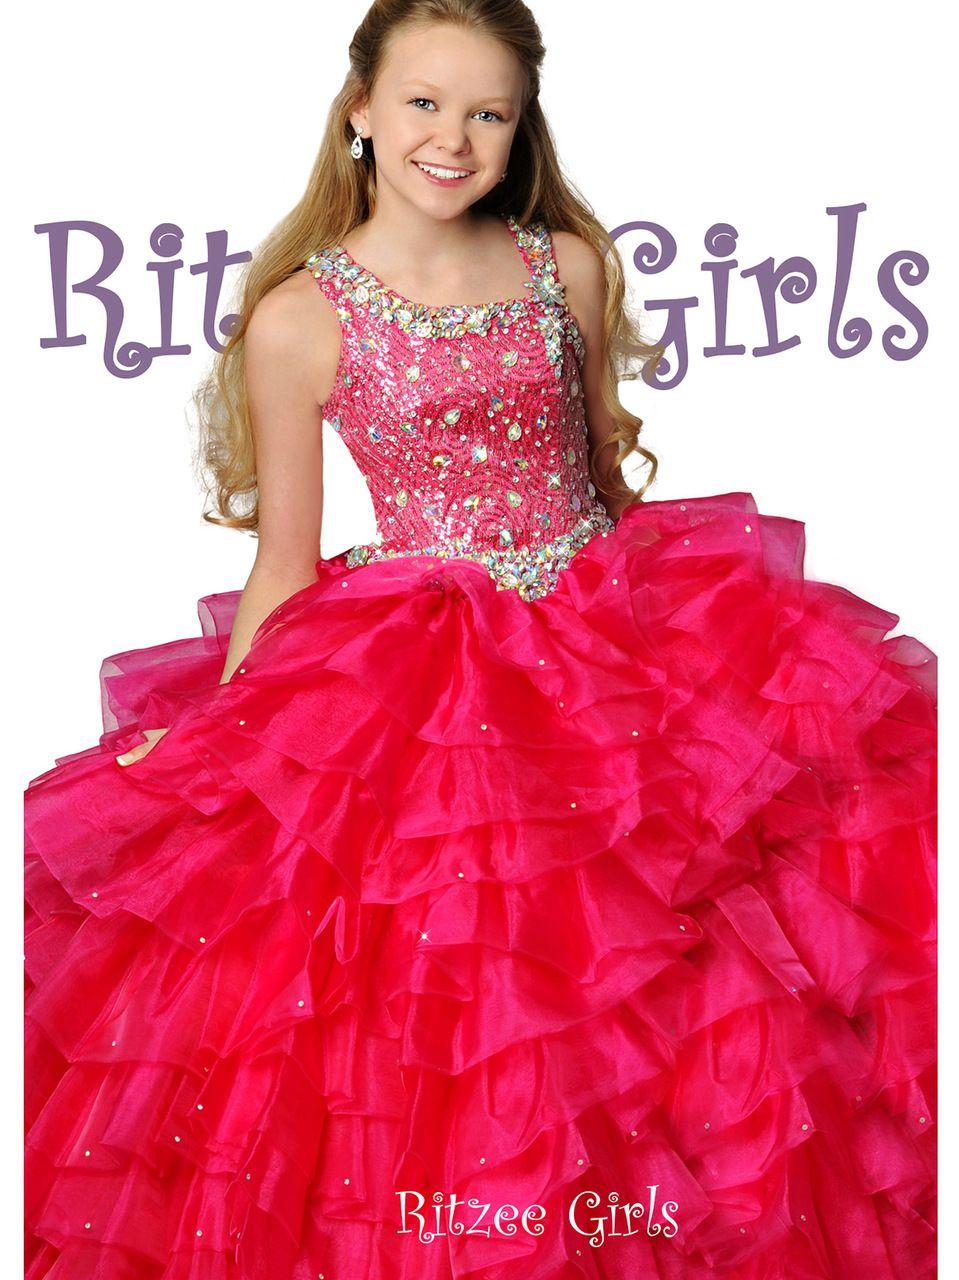 Ritzee Girl Pageant Dress 6450 | tween dresses | Pinterest | Girls ...